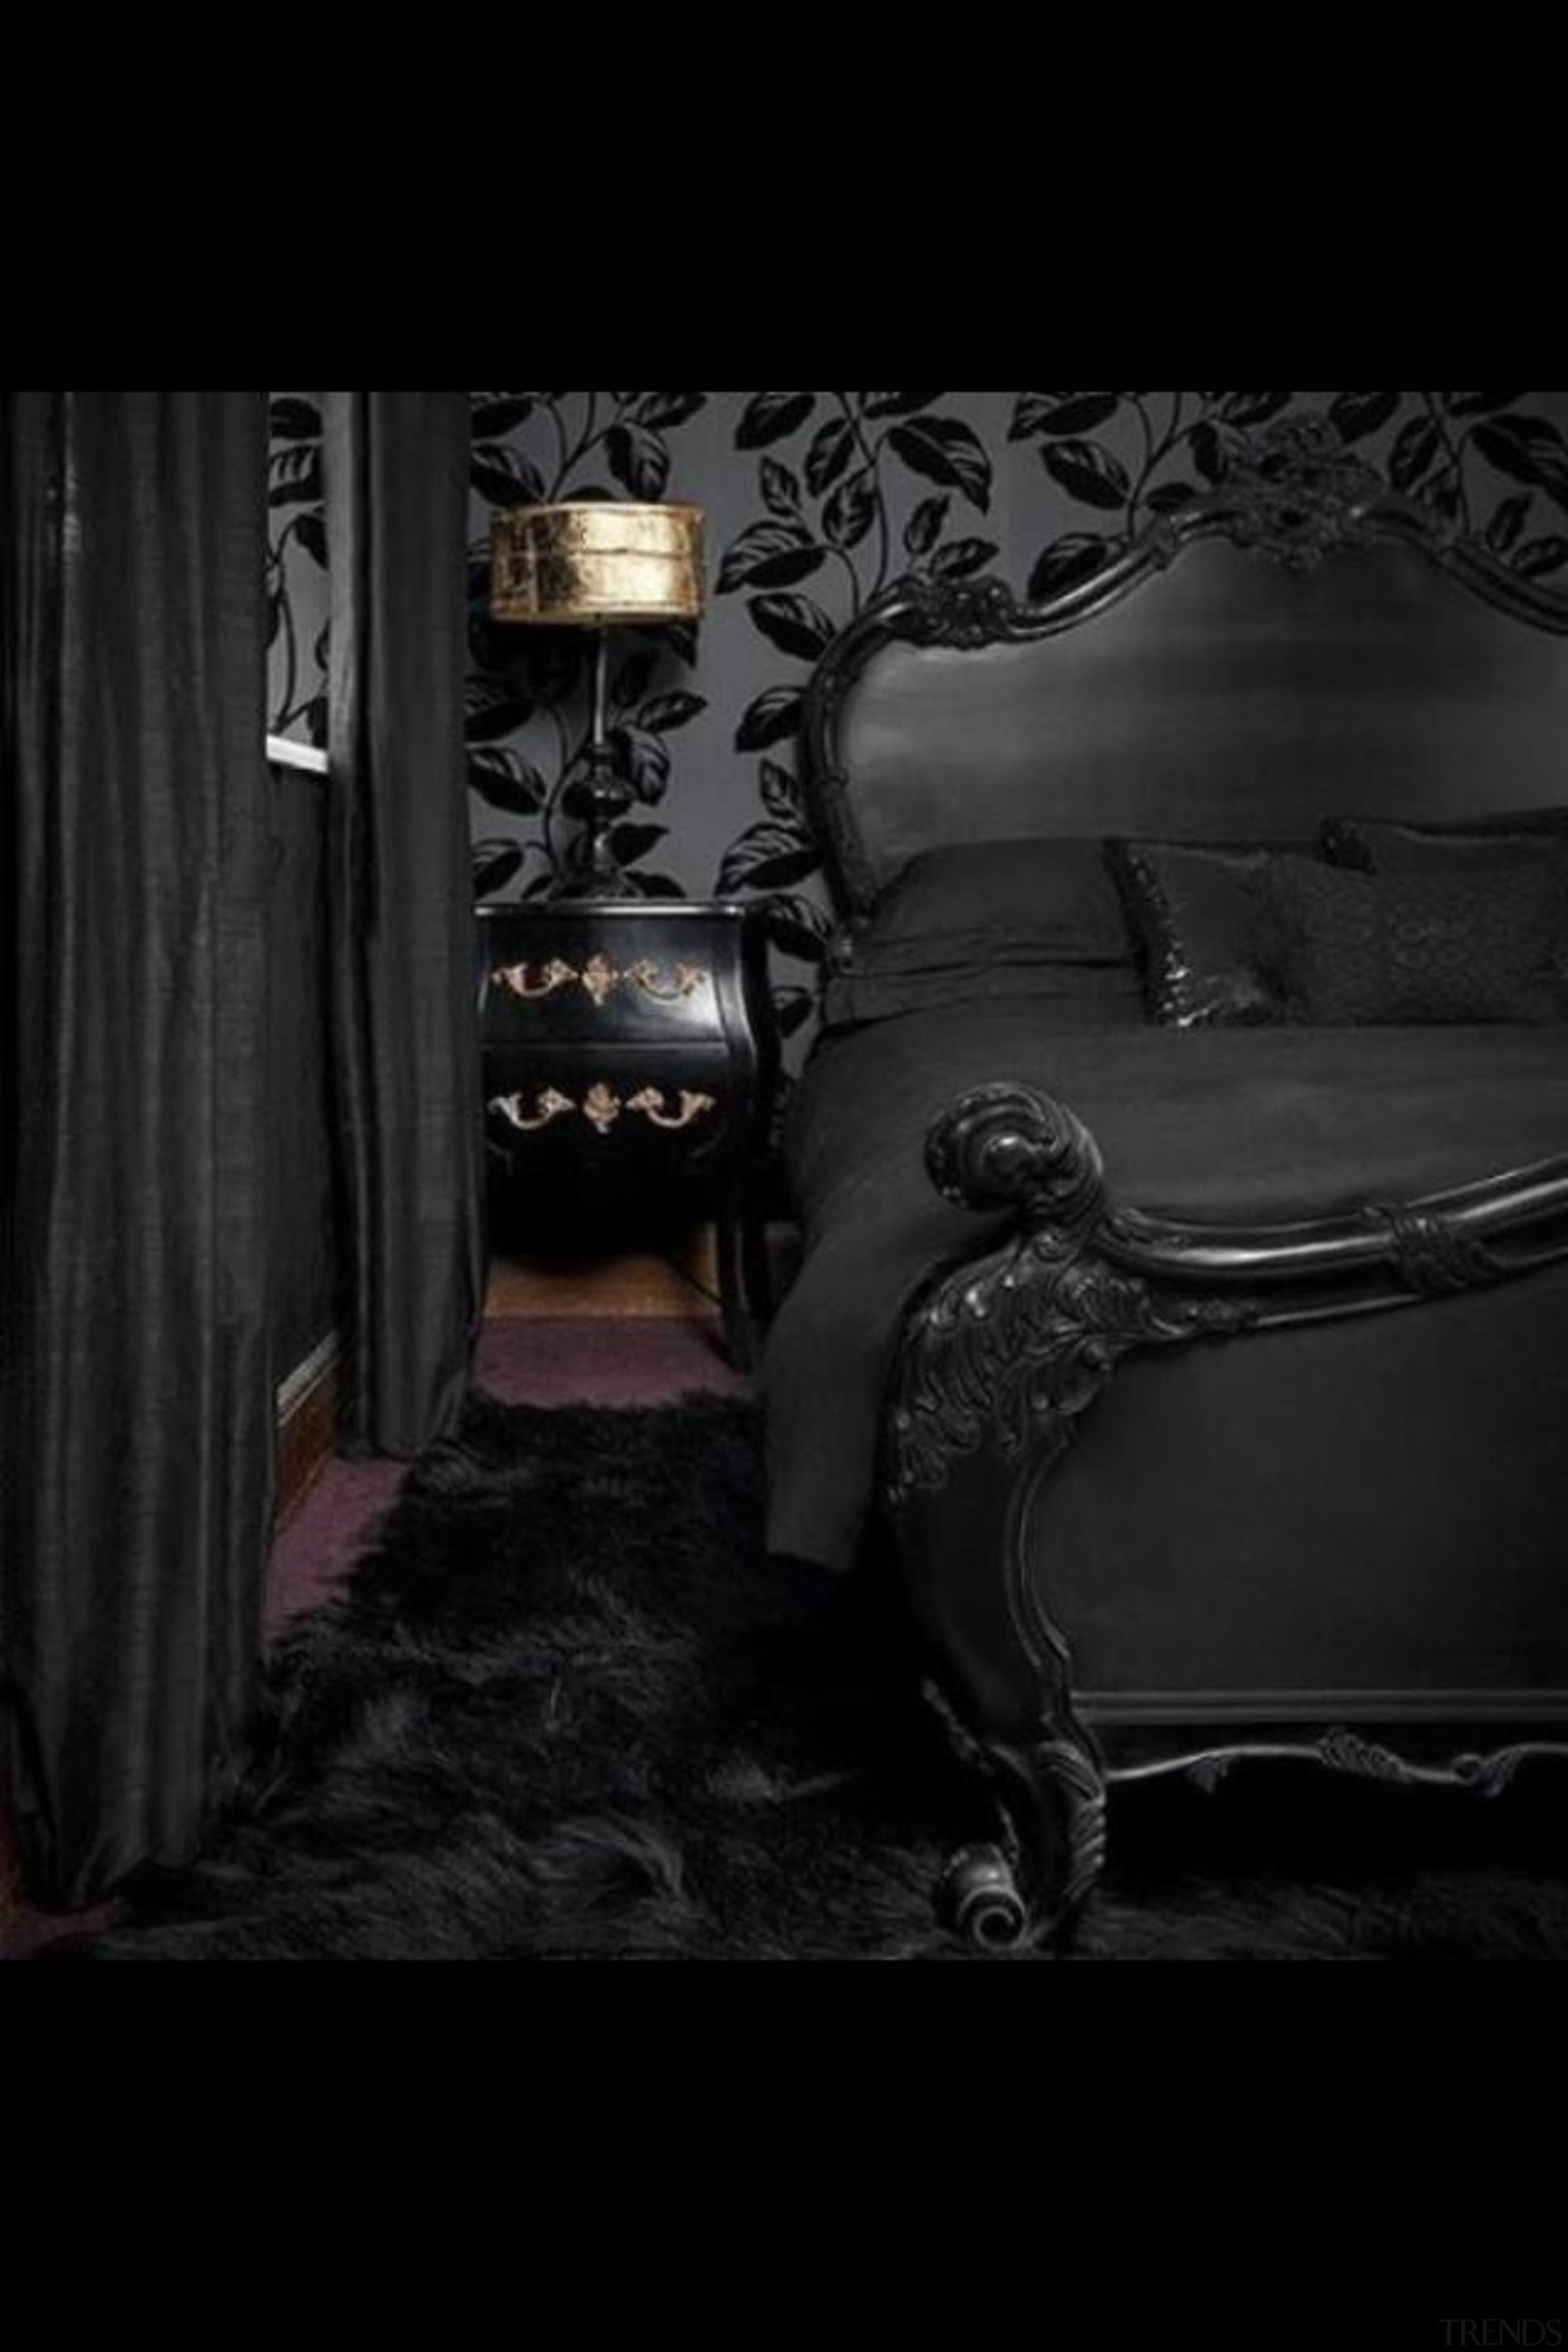 Black Wallpaper,Black Linen, Black HeadBoard - Black Bedroom black, black and white, darkness, light, midnight, monochrome, monochrome photography, photograph, photography, screenshot, still life photography, black